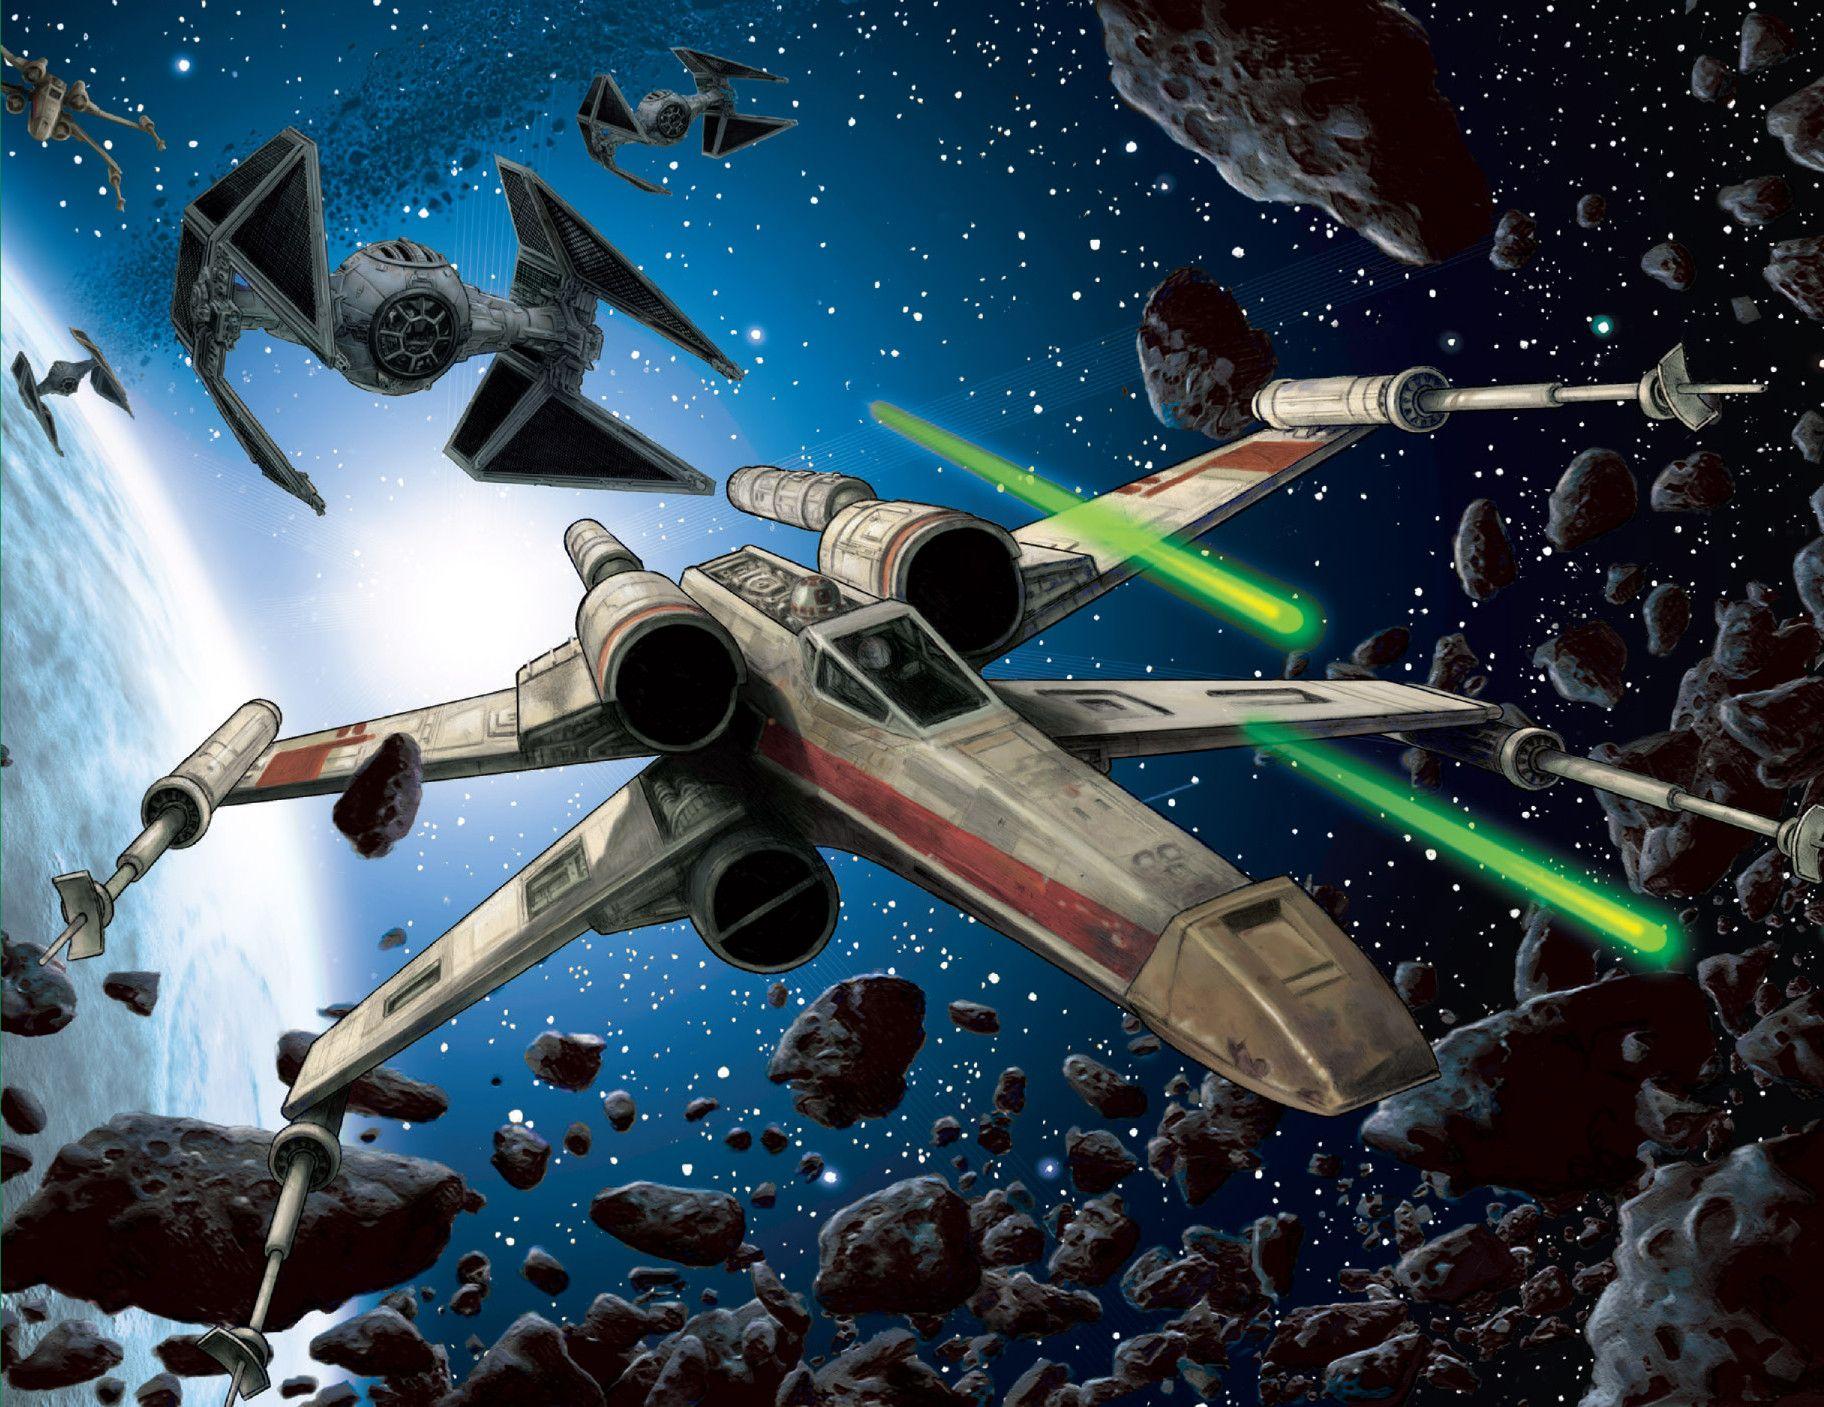 X-Wing Rogue Squadron Vol 01 Art by Doug Wheatley   Star